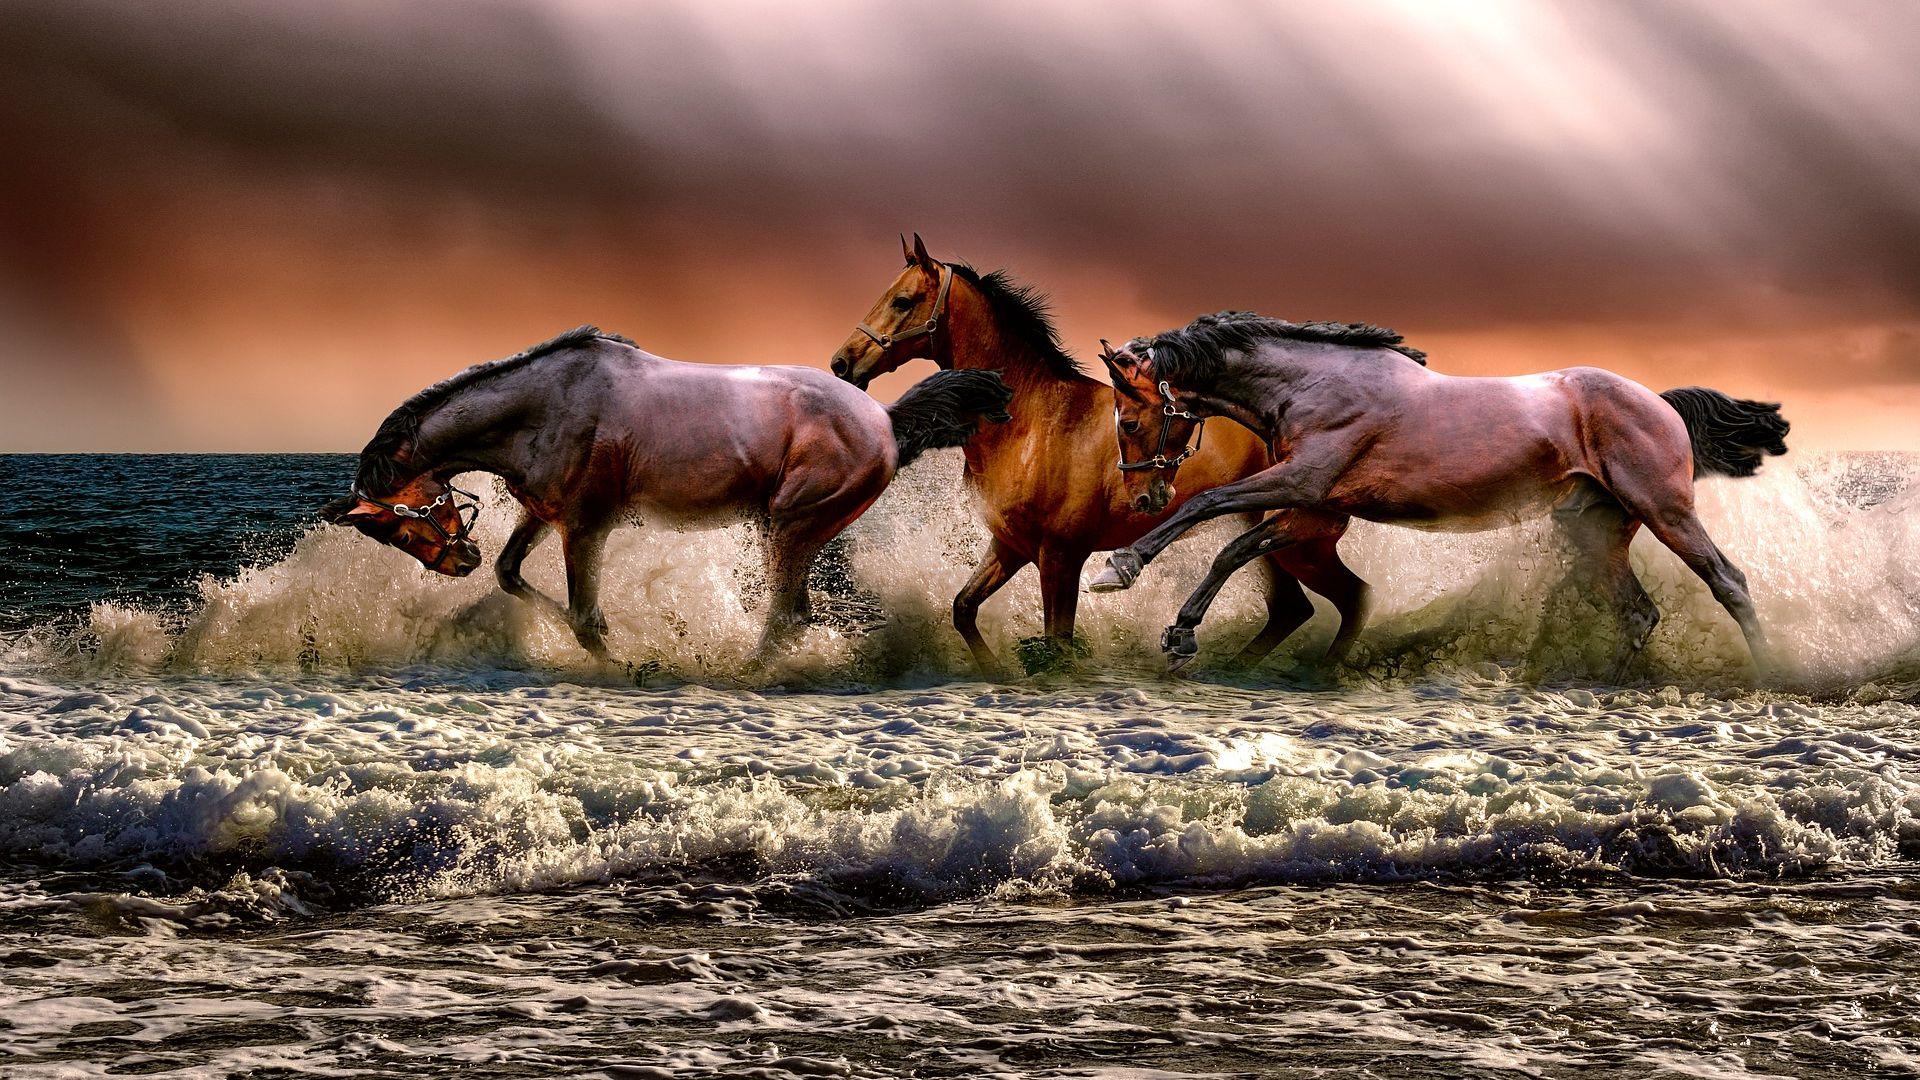 38 Cavalry Wallpaper On Wallpapersafari